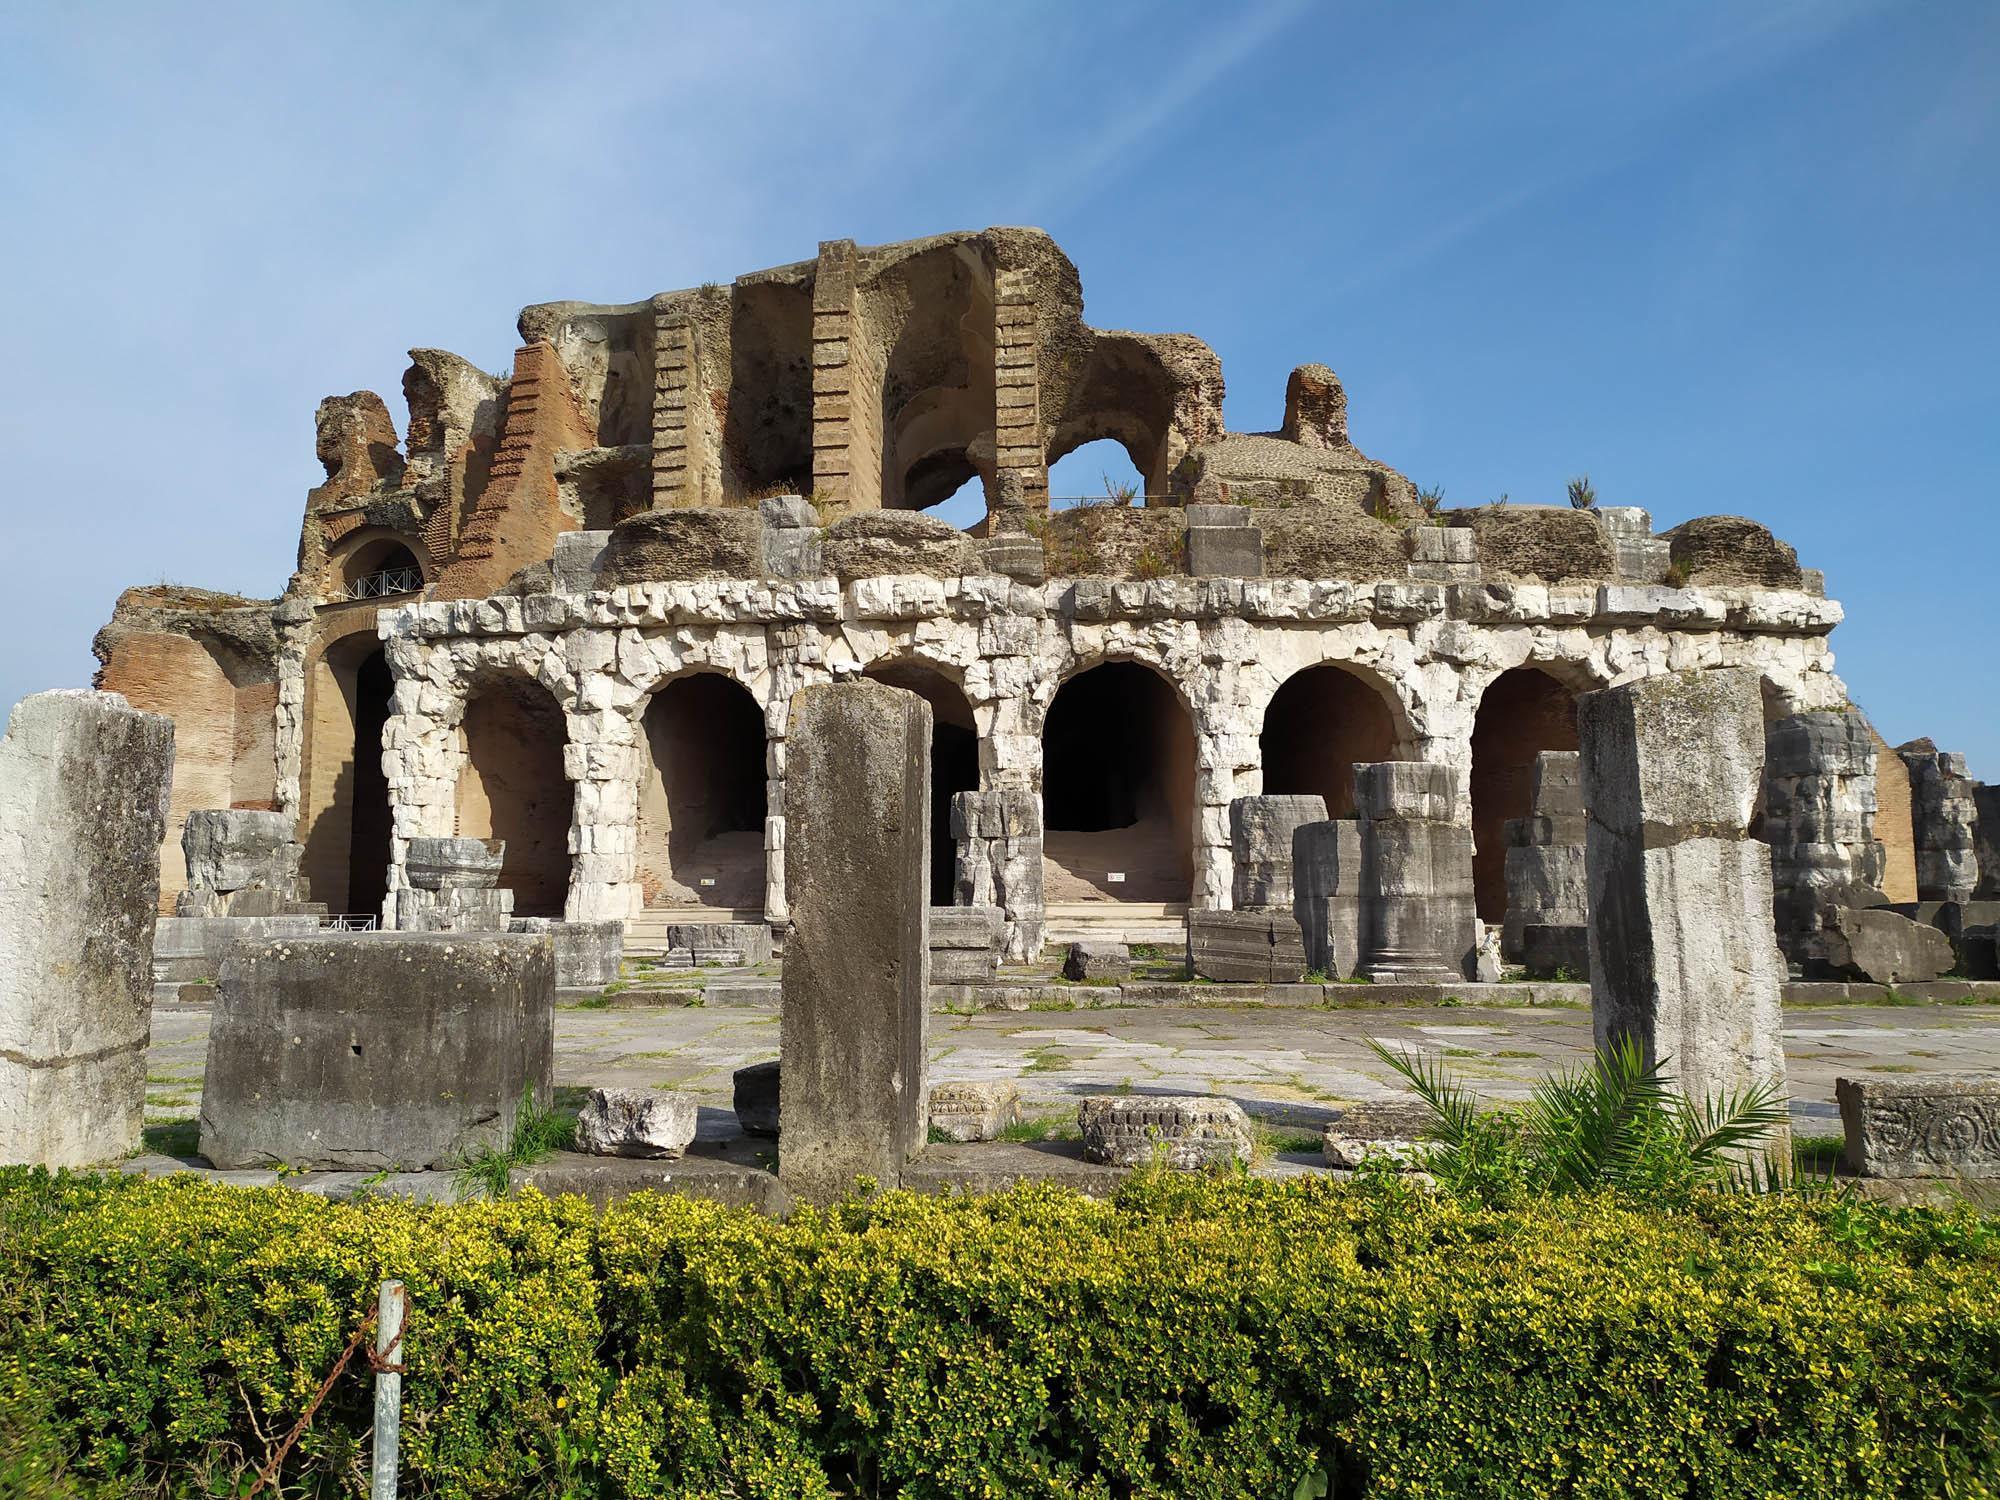 Sabato 31.10.2020 Visita guidata all'Anfiteatro di Santa Maria Capua Vetere